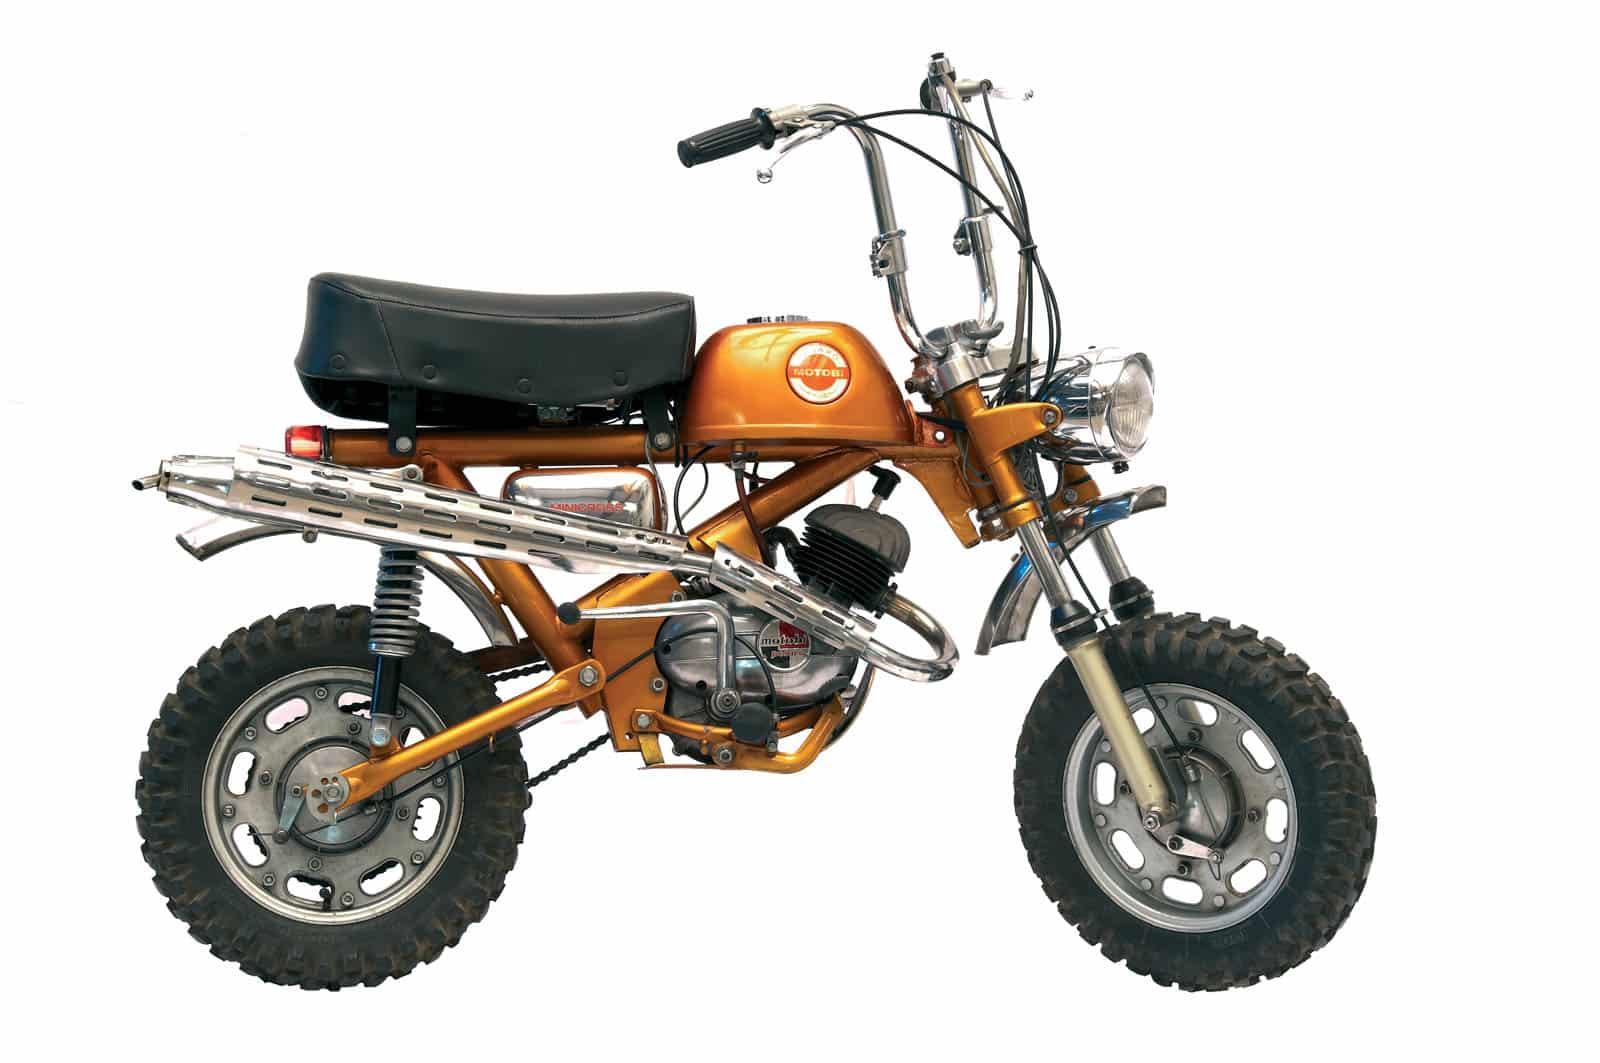 Benelli Mini Cross ciclomotore moped